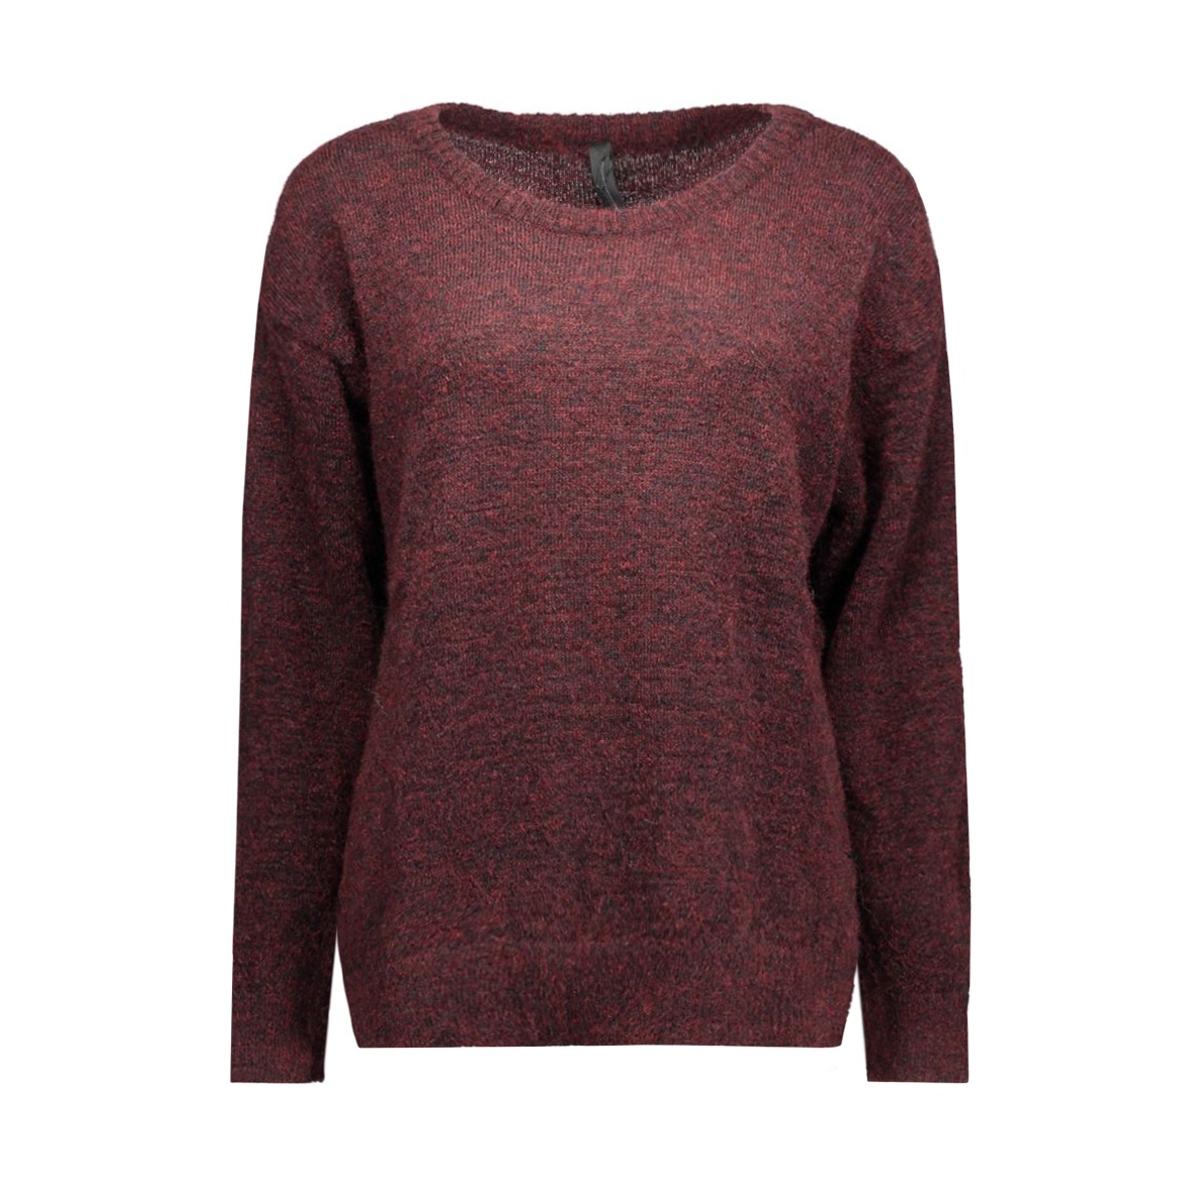 16wi603 10 days sweater bordeaux